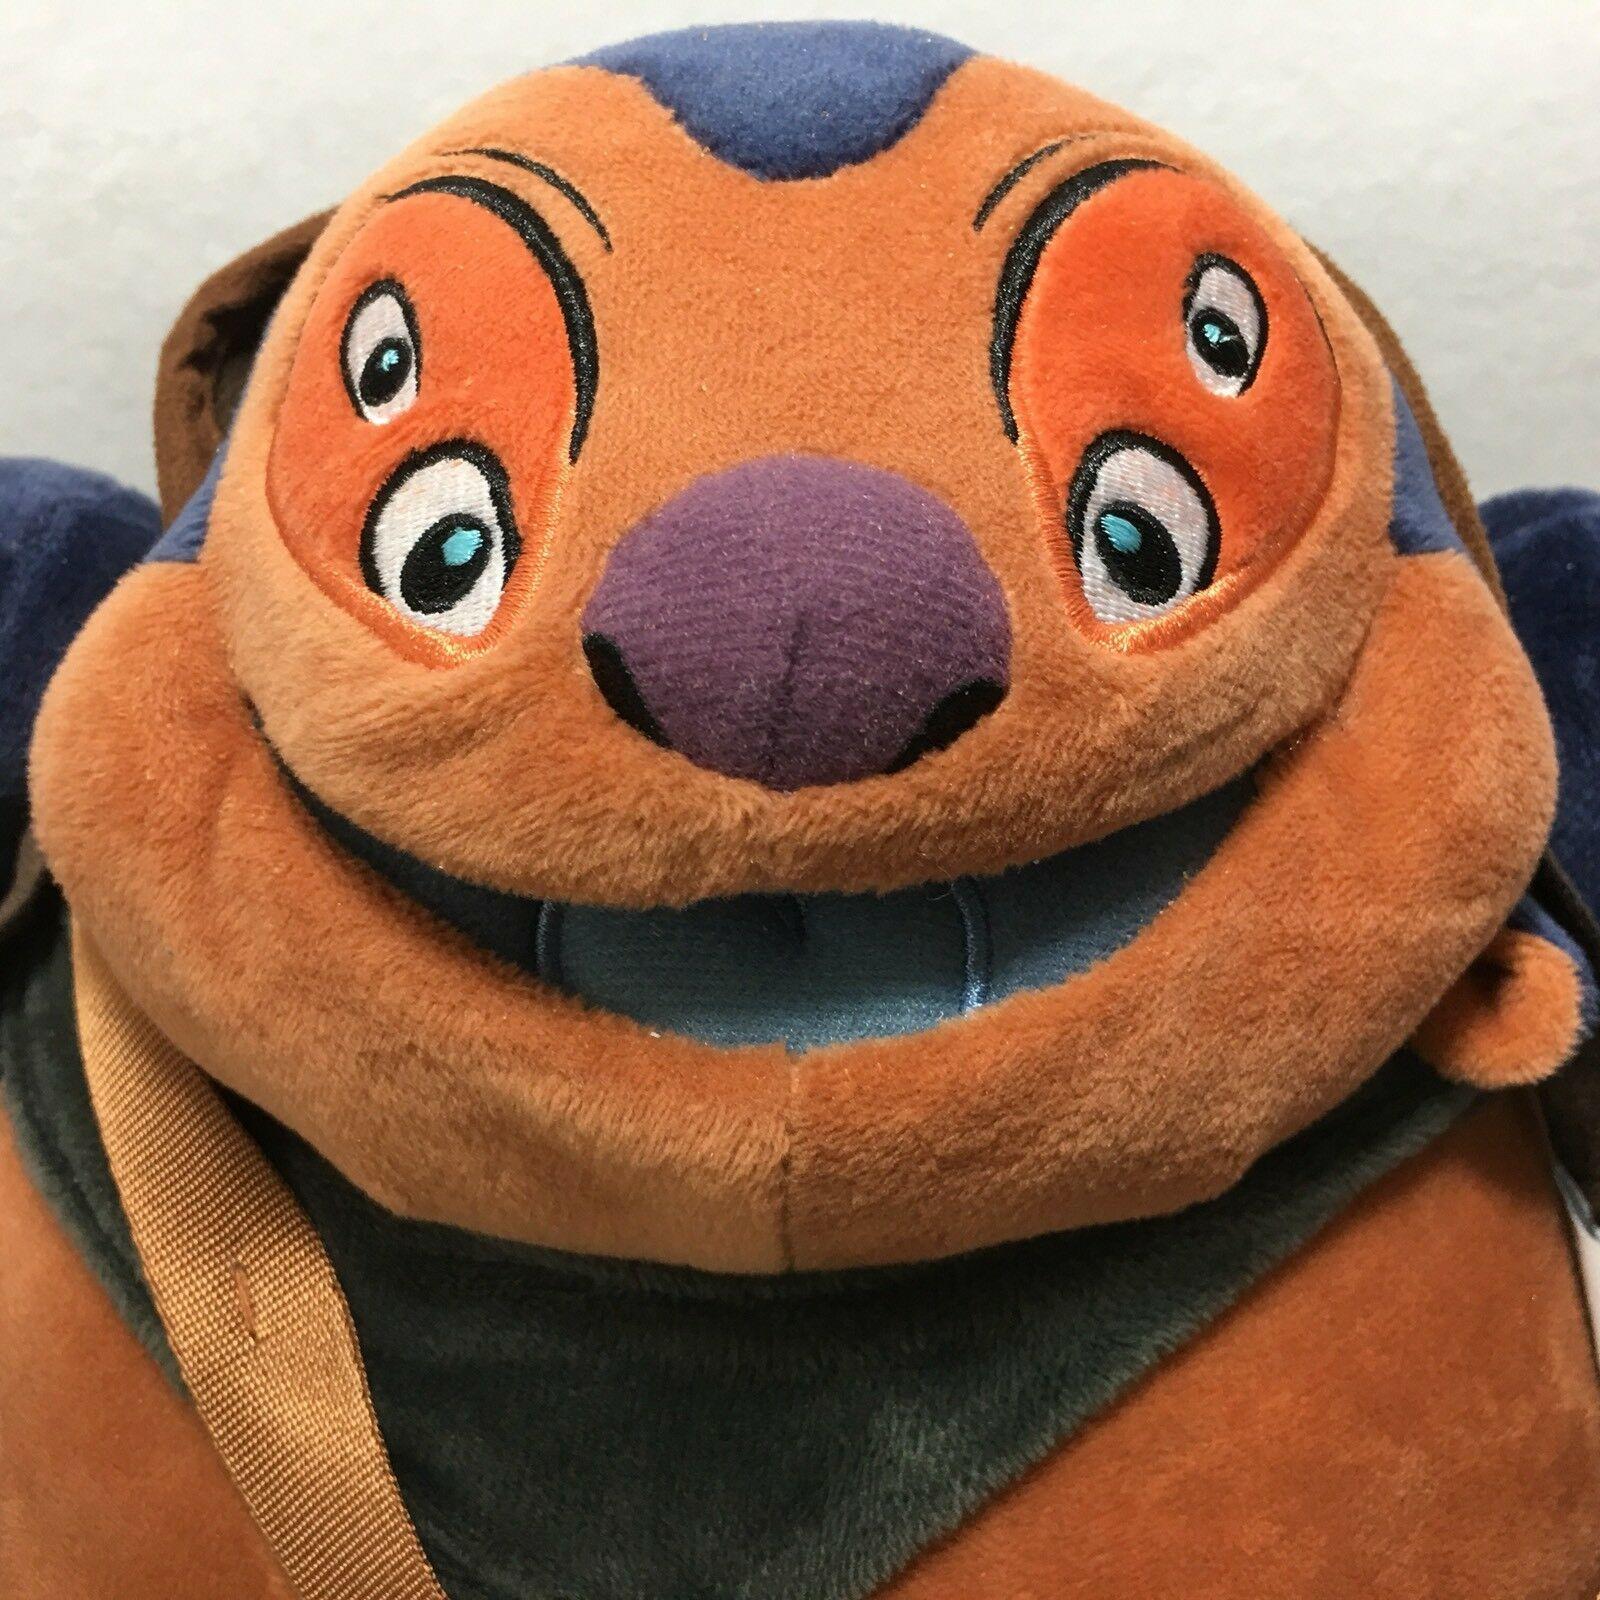 Disney Store Dr Jumba Jookiba Plush From Lilo & Stitch 13 Inch Mad Scientist image 2